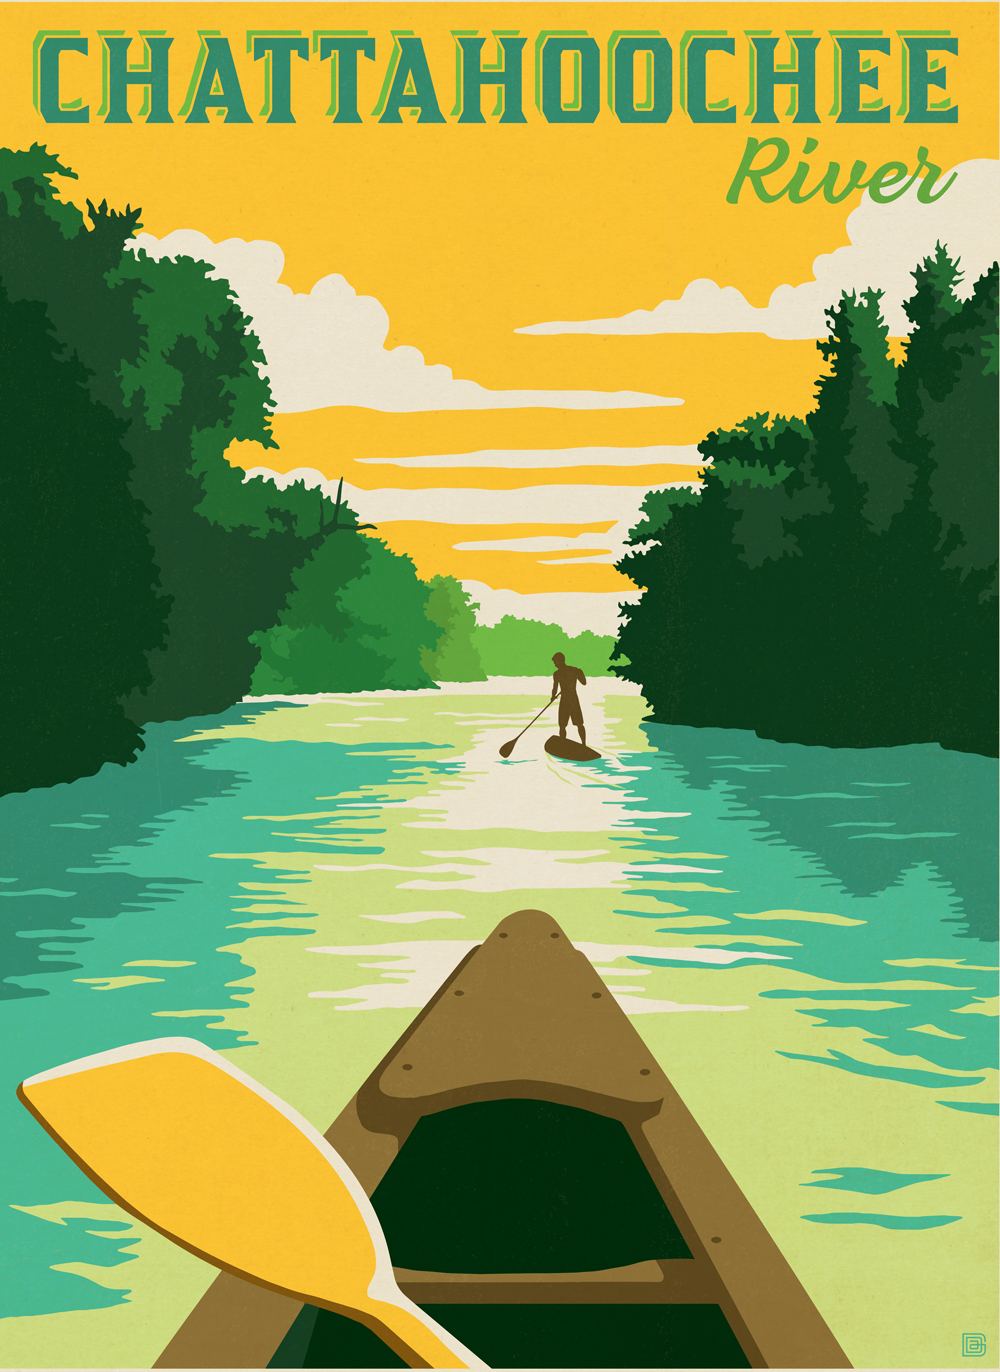 Chattahoochee River cover illustration